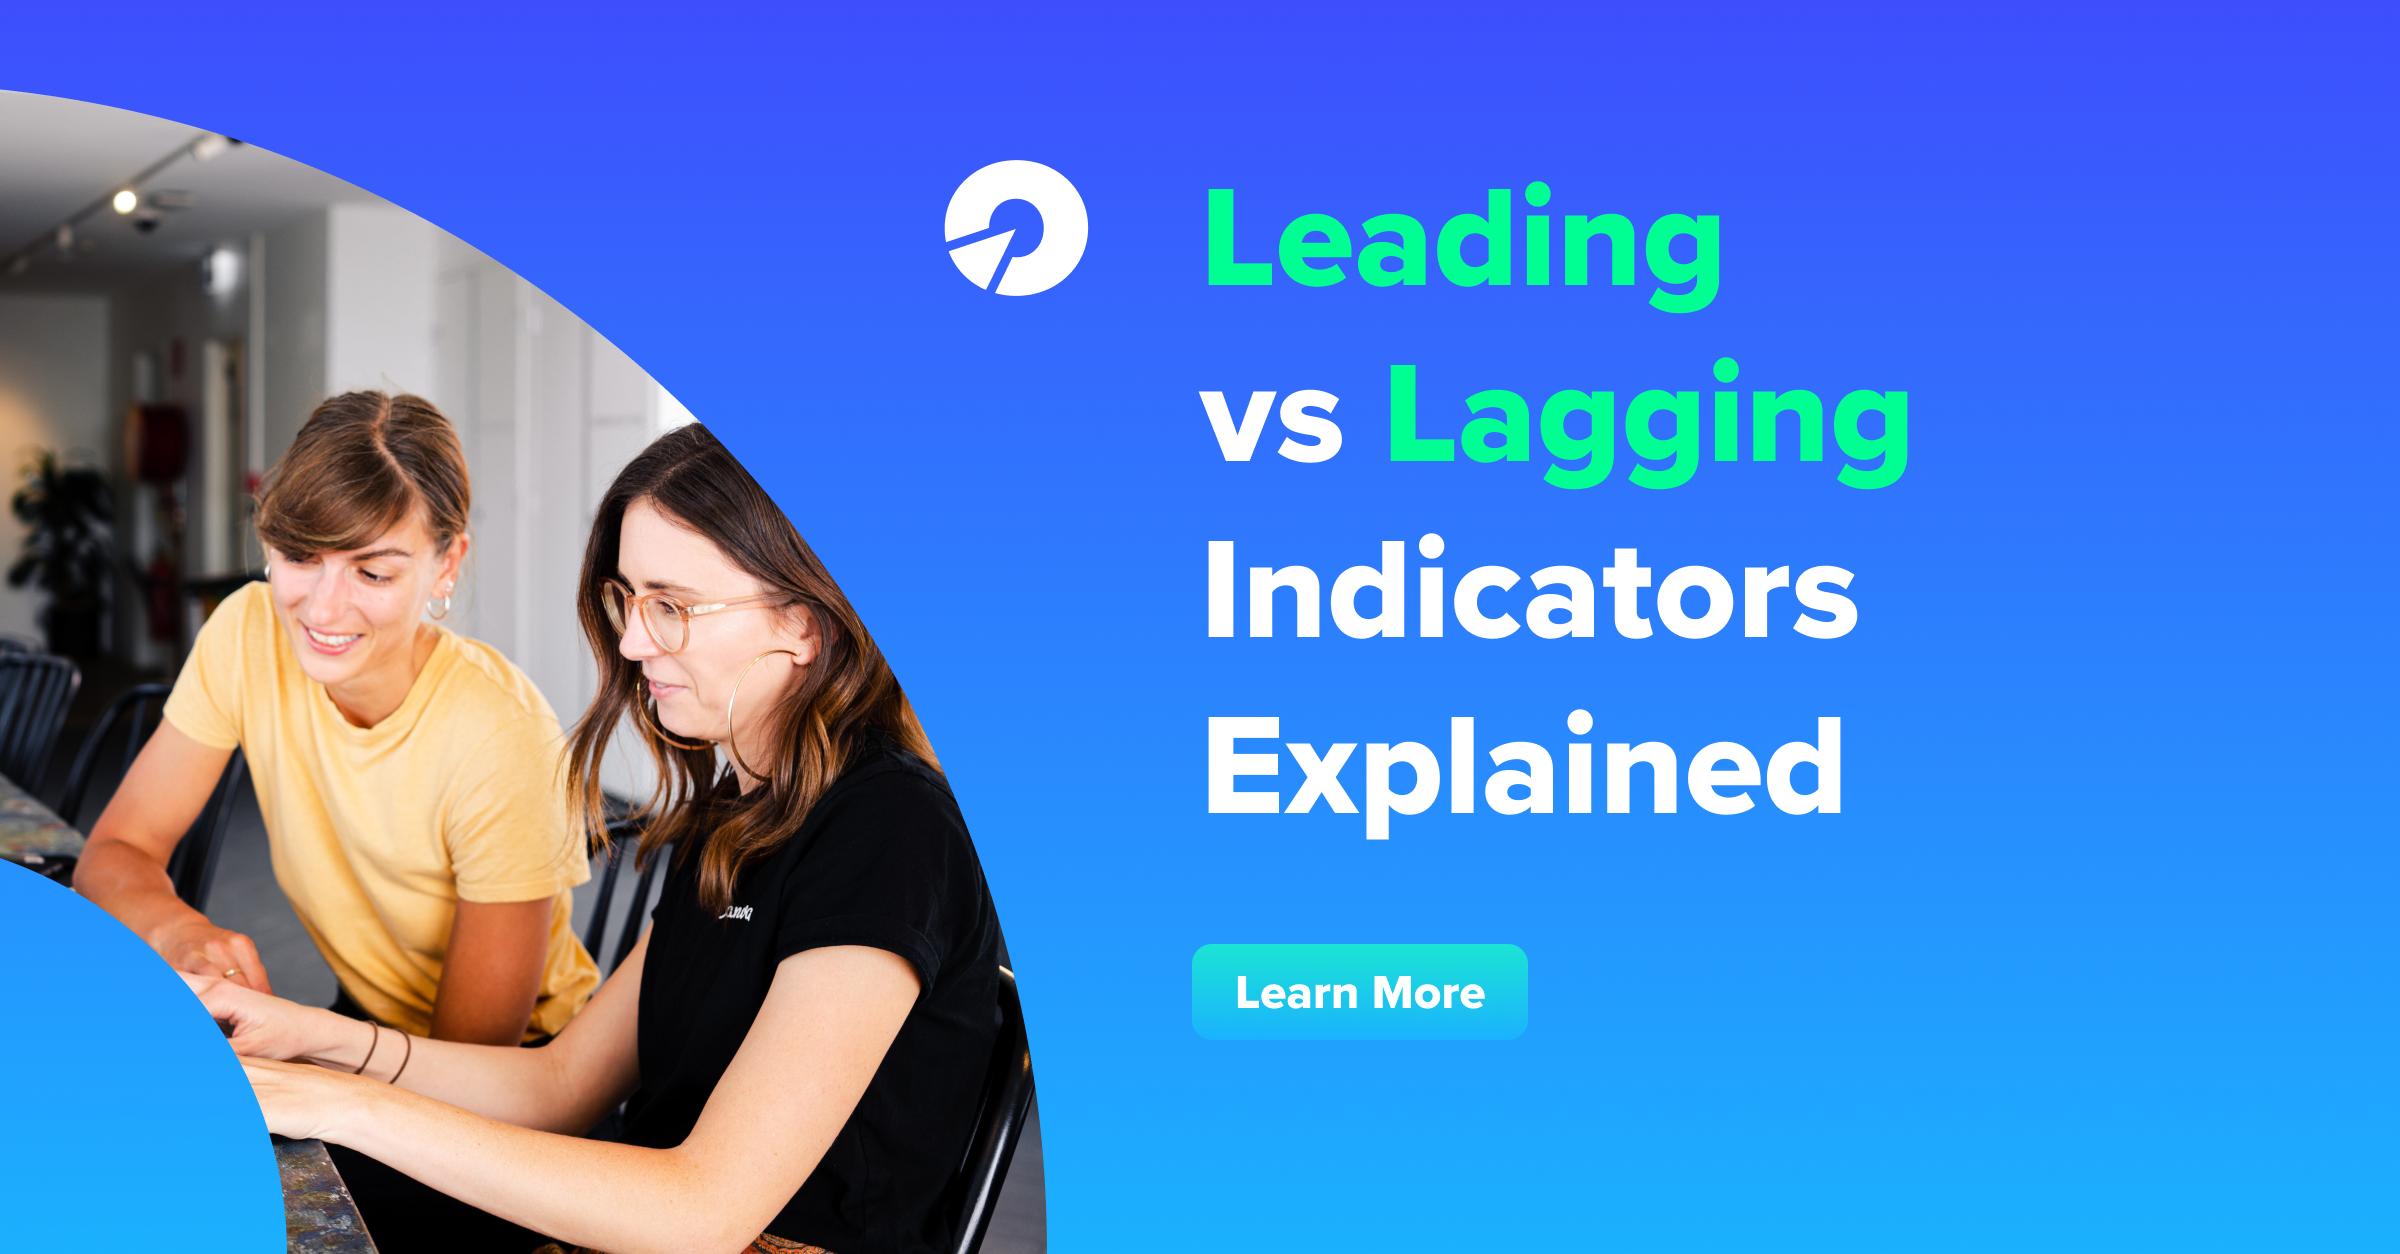 Leading vs Lagging Indicators Explained